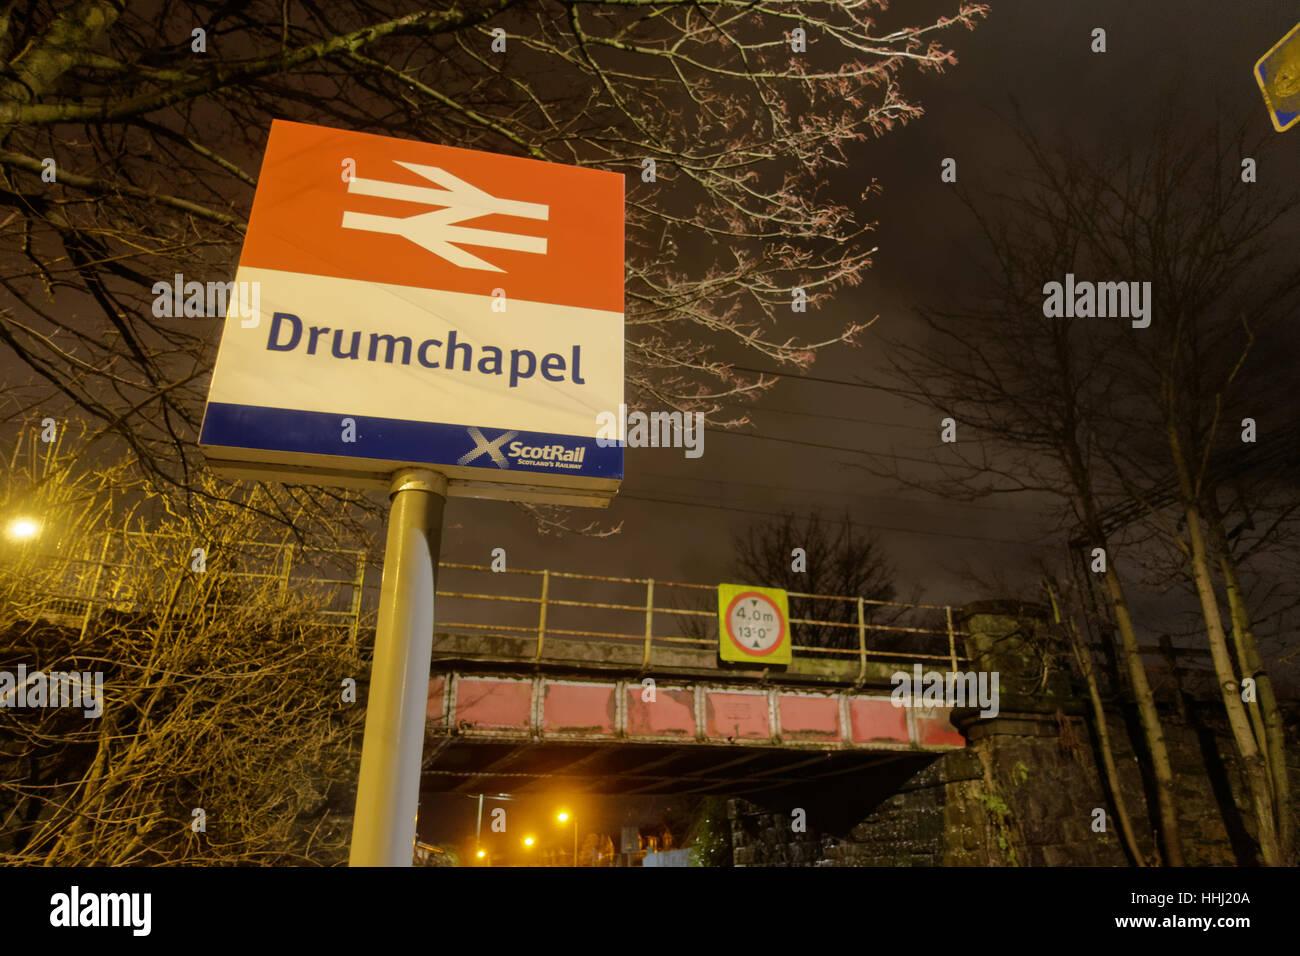 drumchapel  railway station scotrail at night in the dark - Stock Image